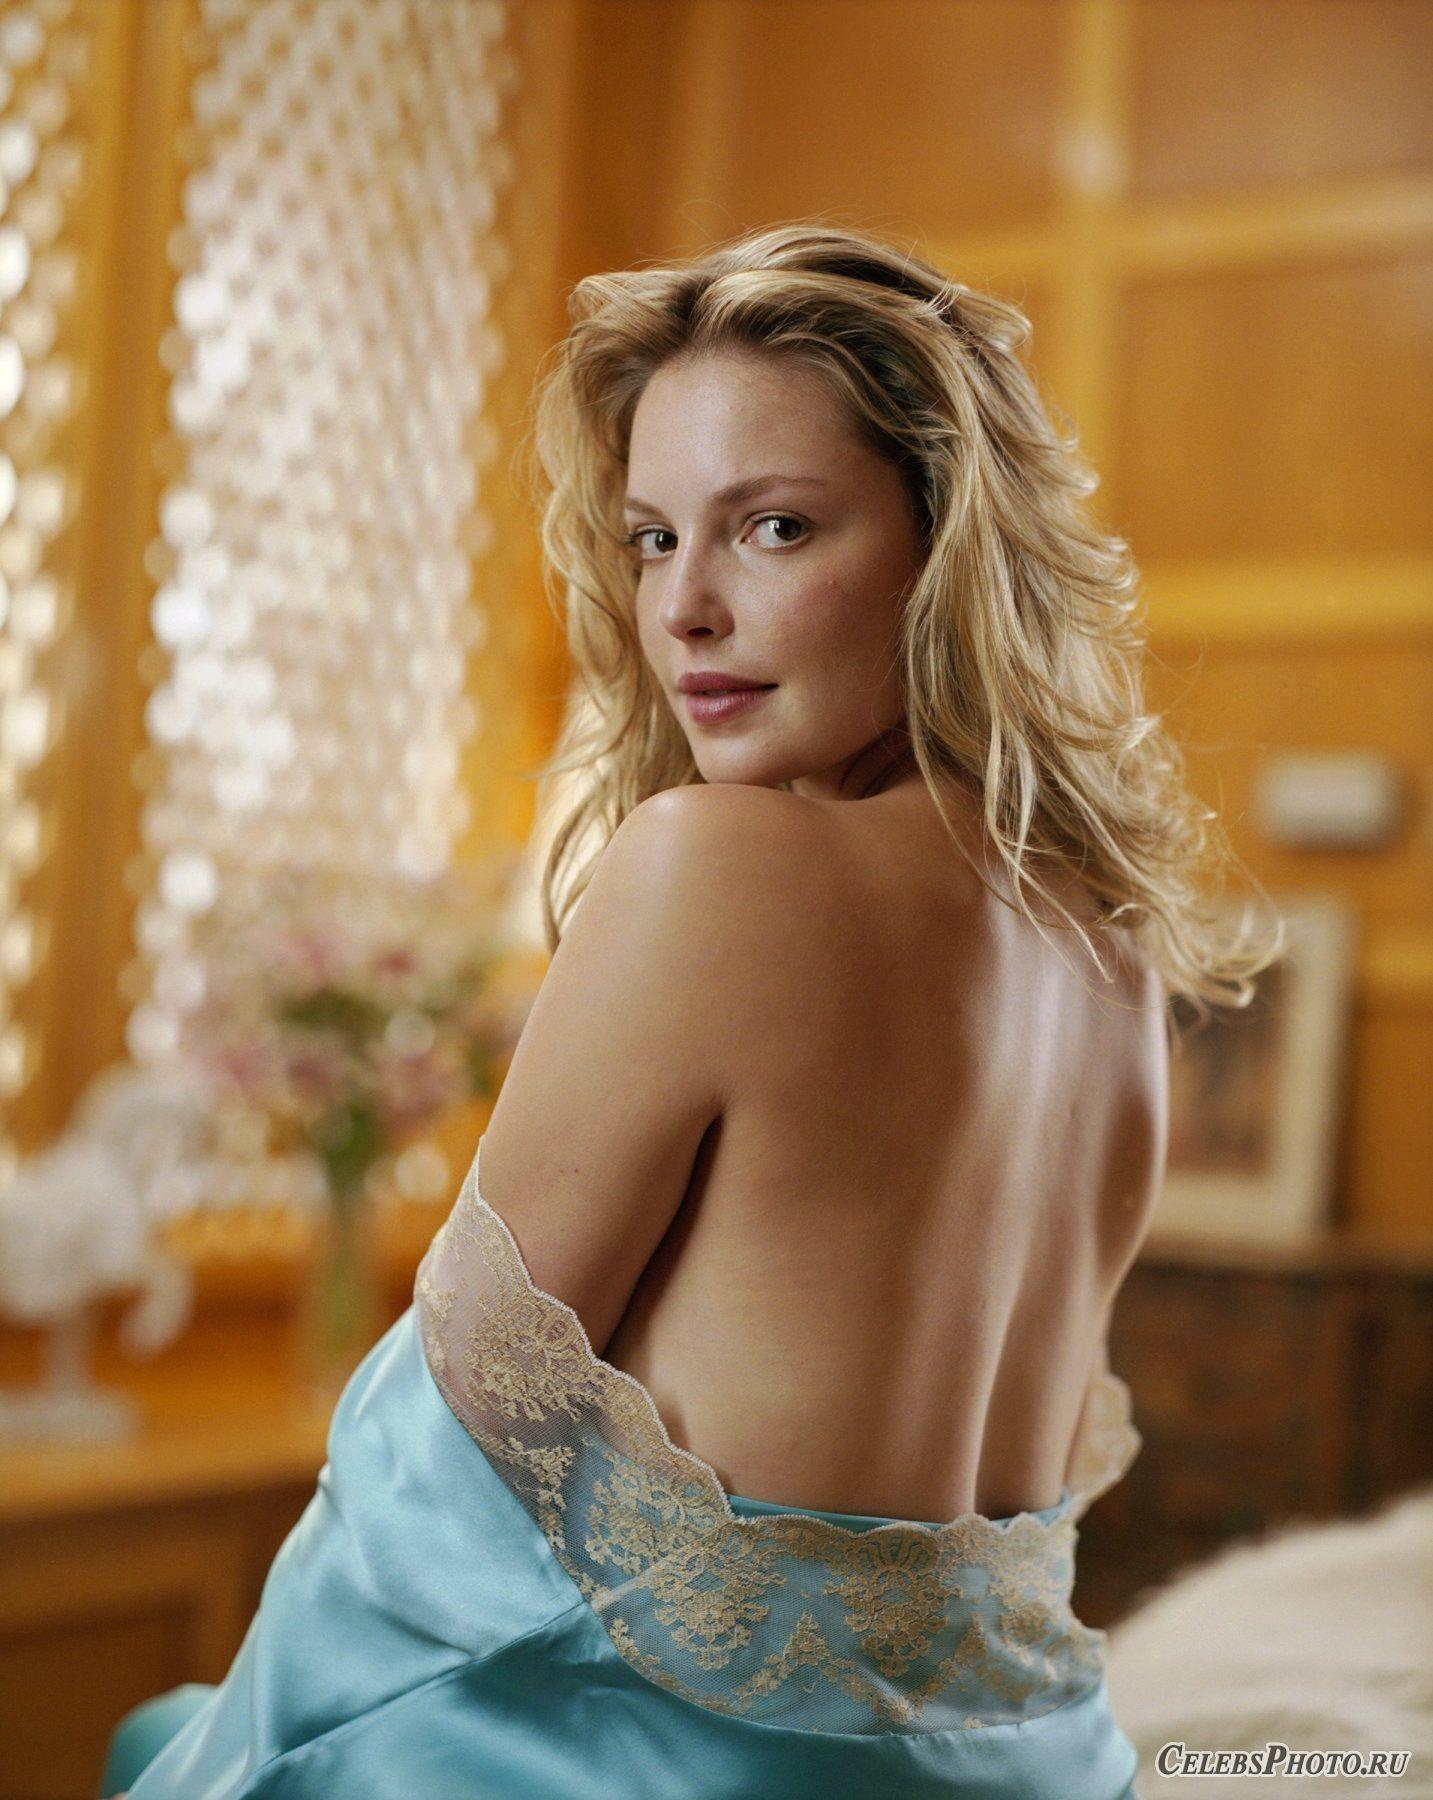 Katherine heigl topless maxim magazine cover nude photo shoot